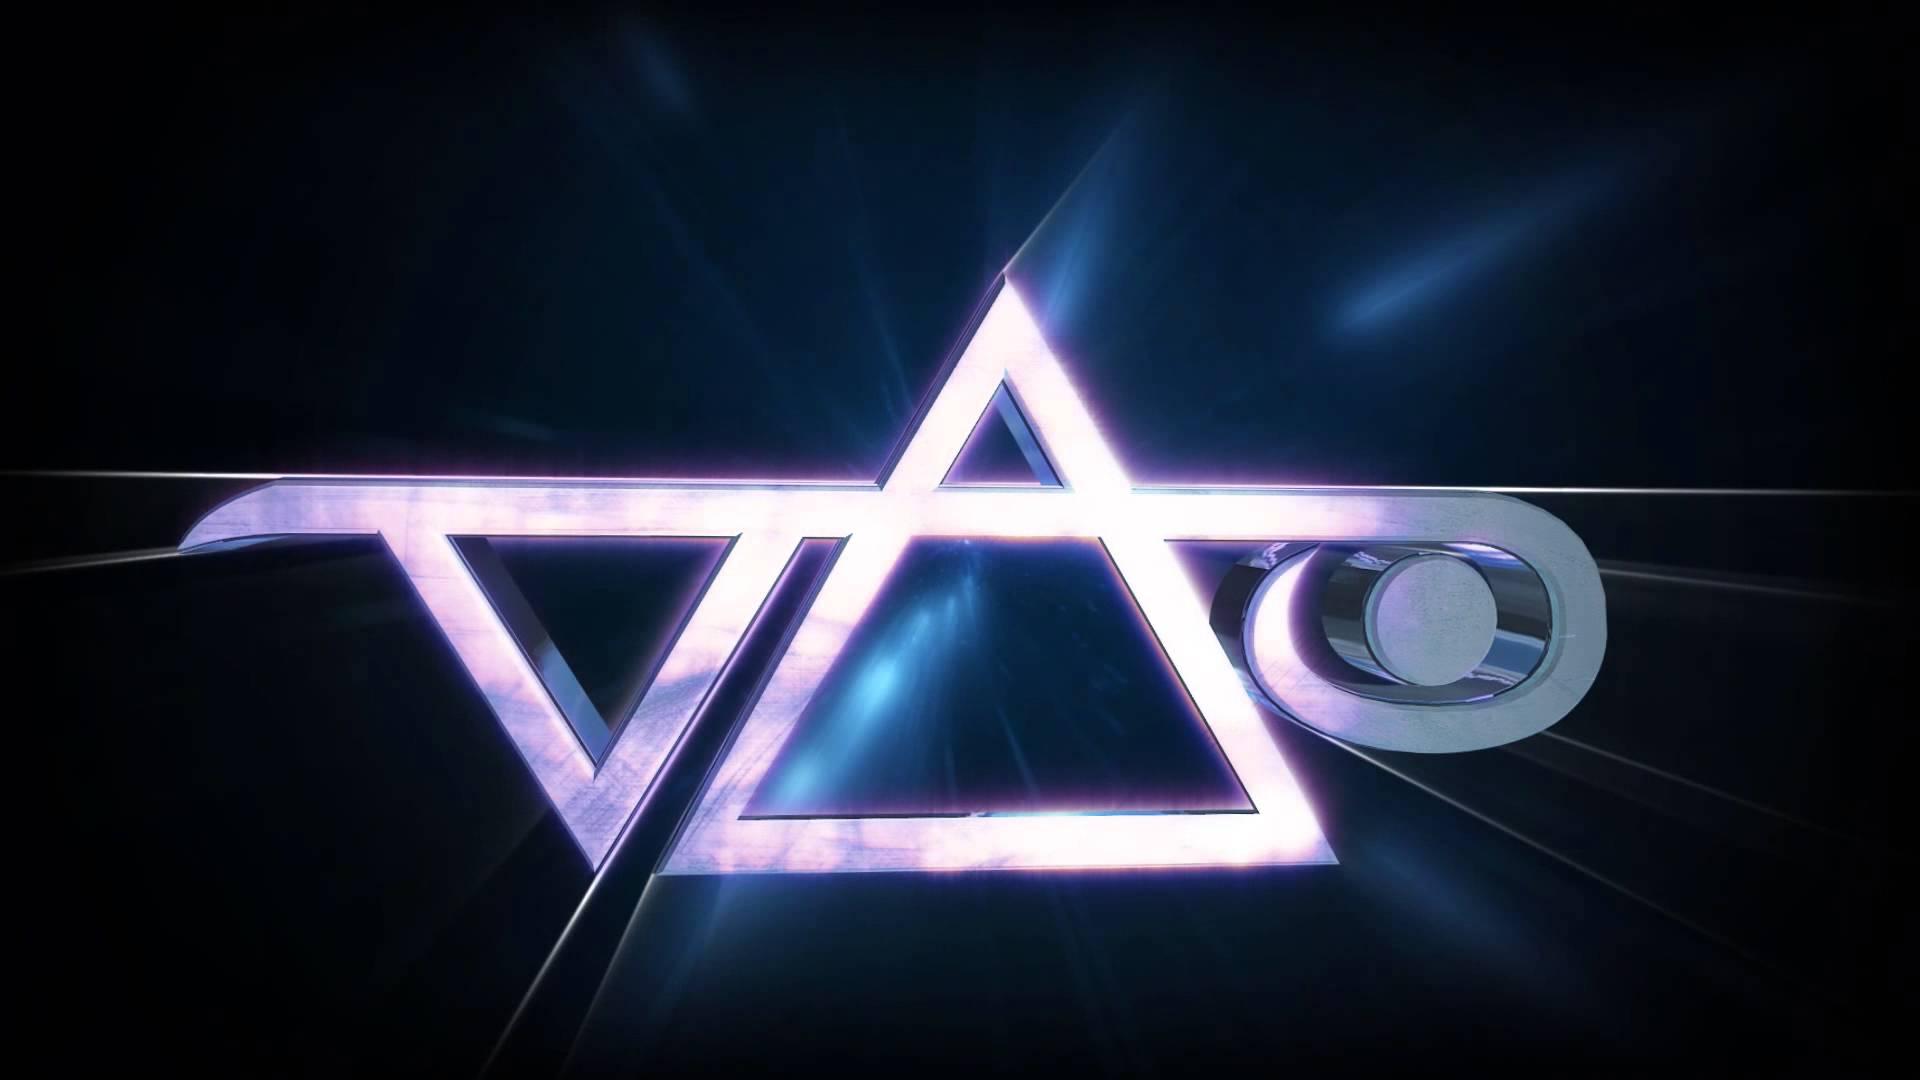 Logotipo de Steve Vai, un logo cargado de simbología mística.